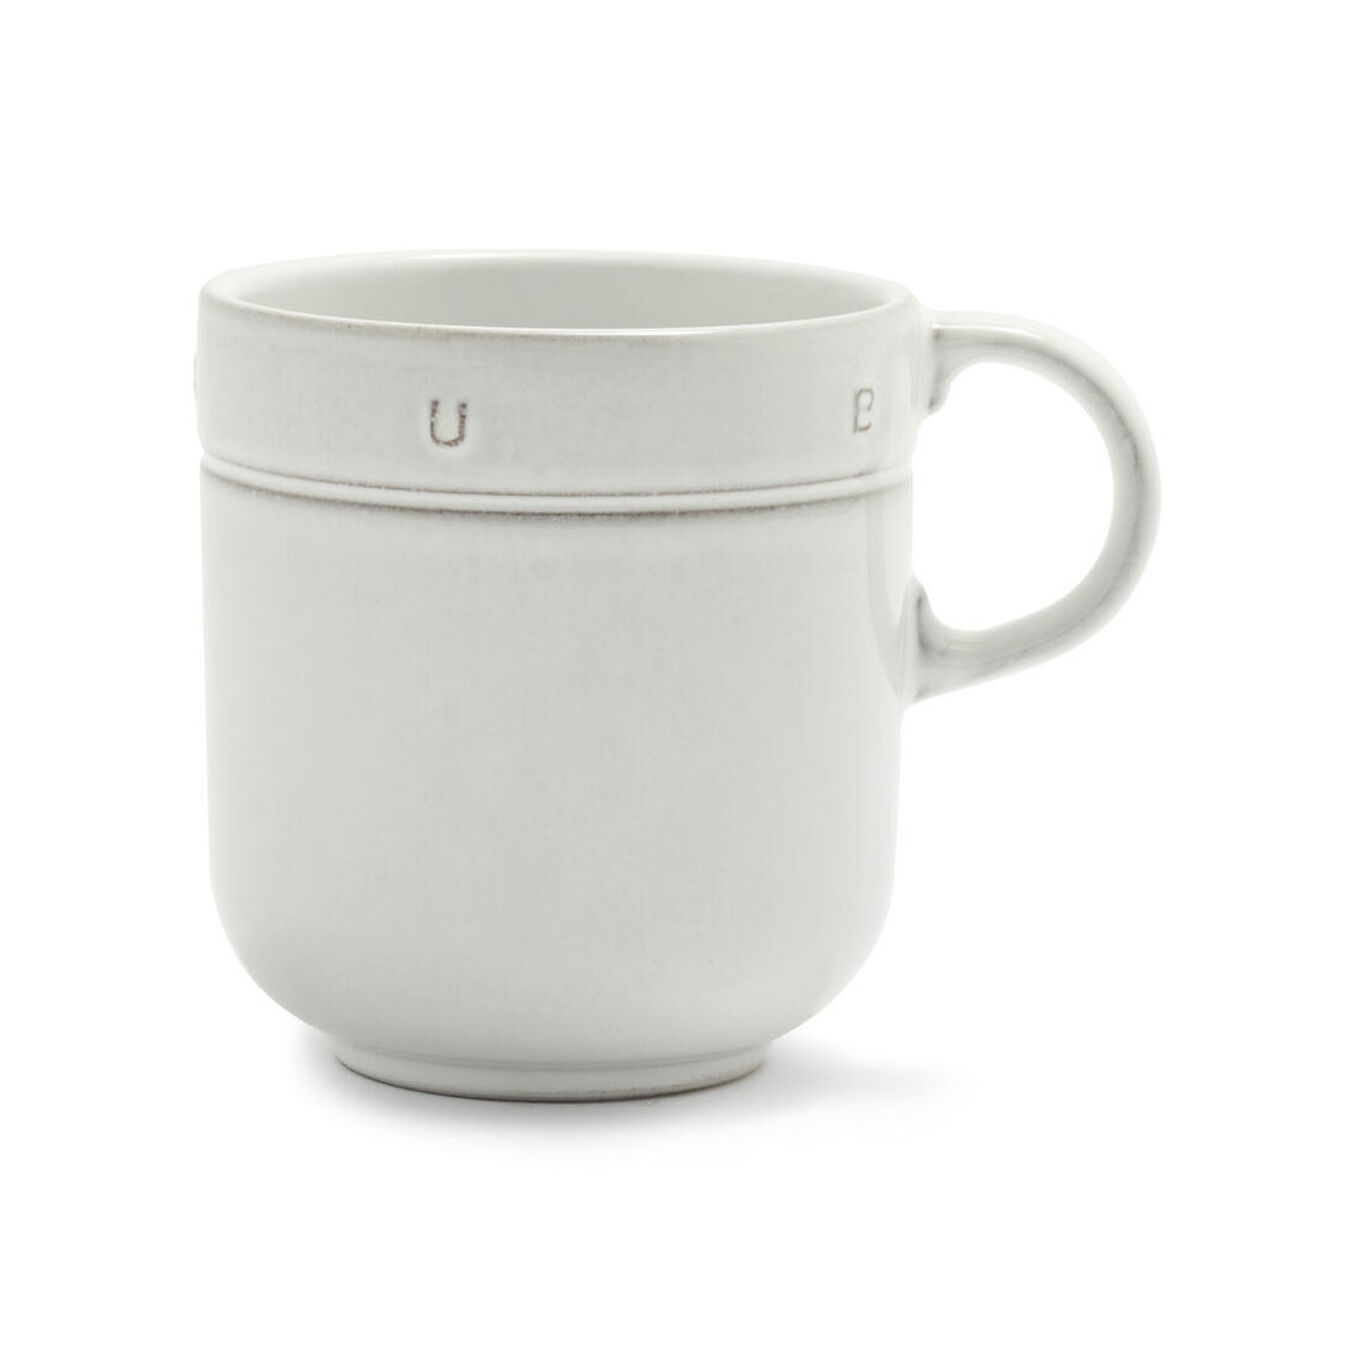 470 ml, Ceramic, Mug 16oz - Off White, Off-White,,large 1